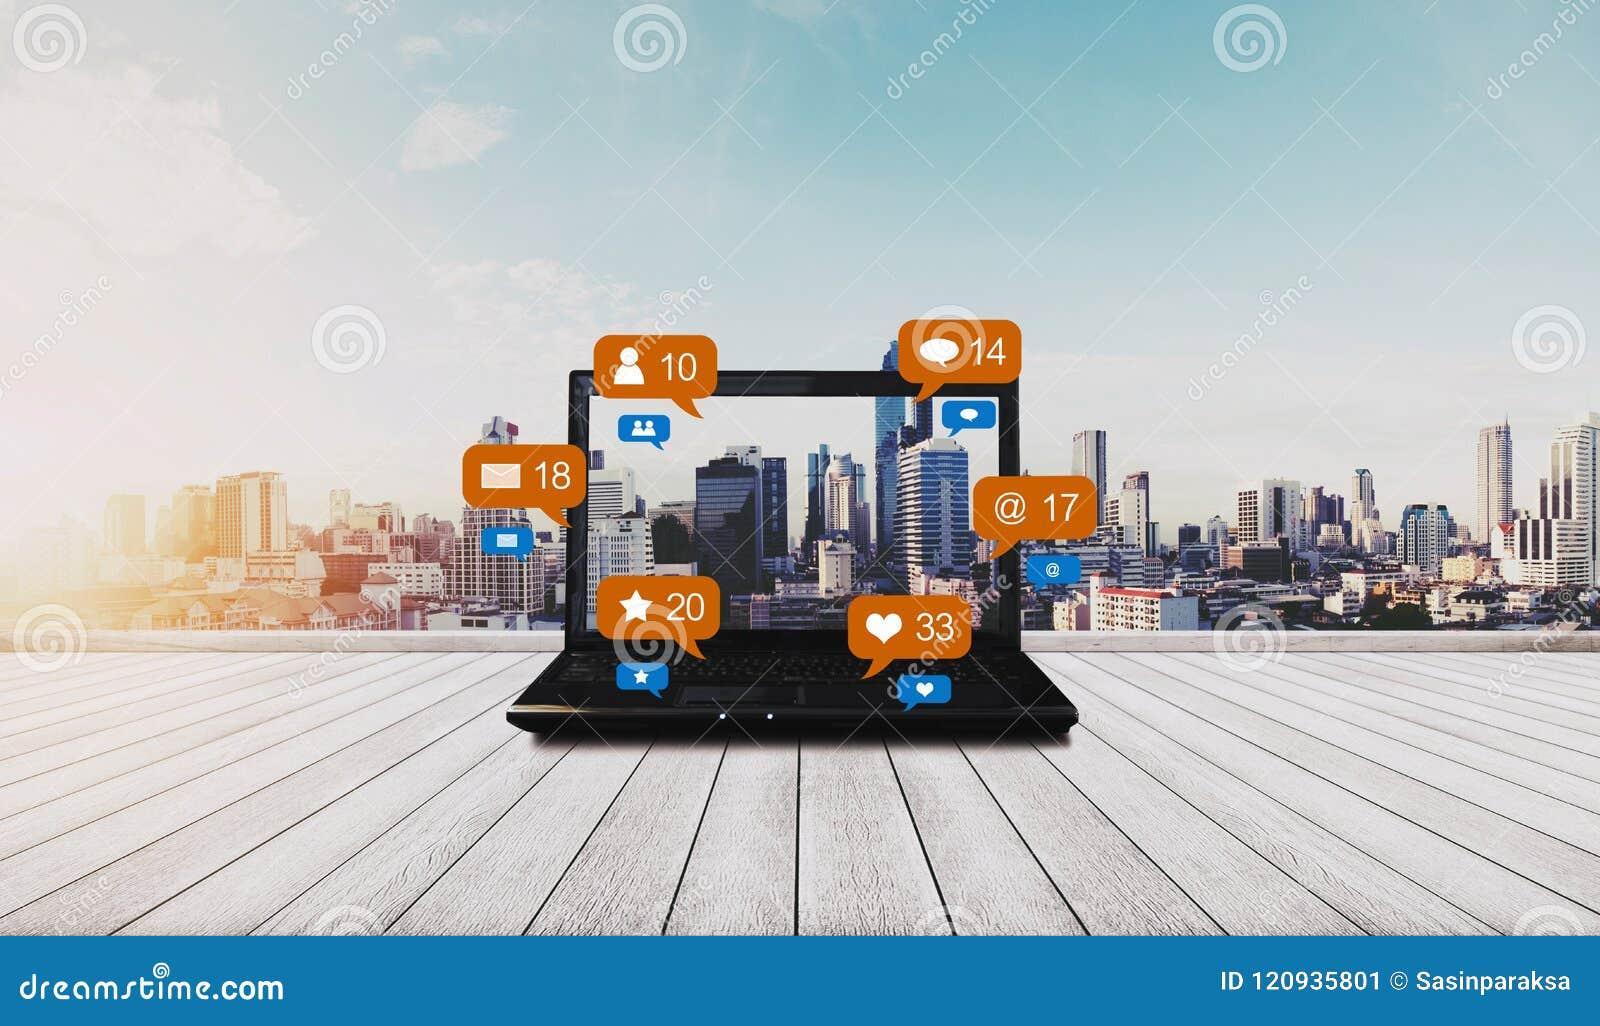 Lap-top υπολογιστών στο ξύλινο γραφείο και κοινωνικά μέσα με τα κοινωνικά εικονίδια ανακοίνωσης δικτύων, υπόβαθρο πόλεων